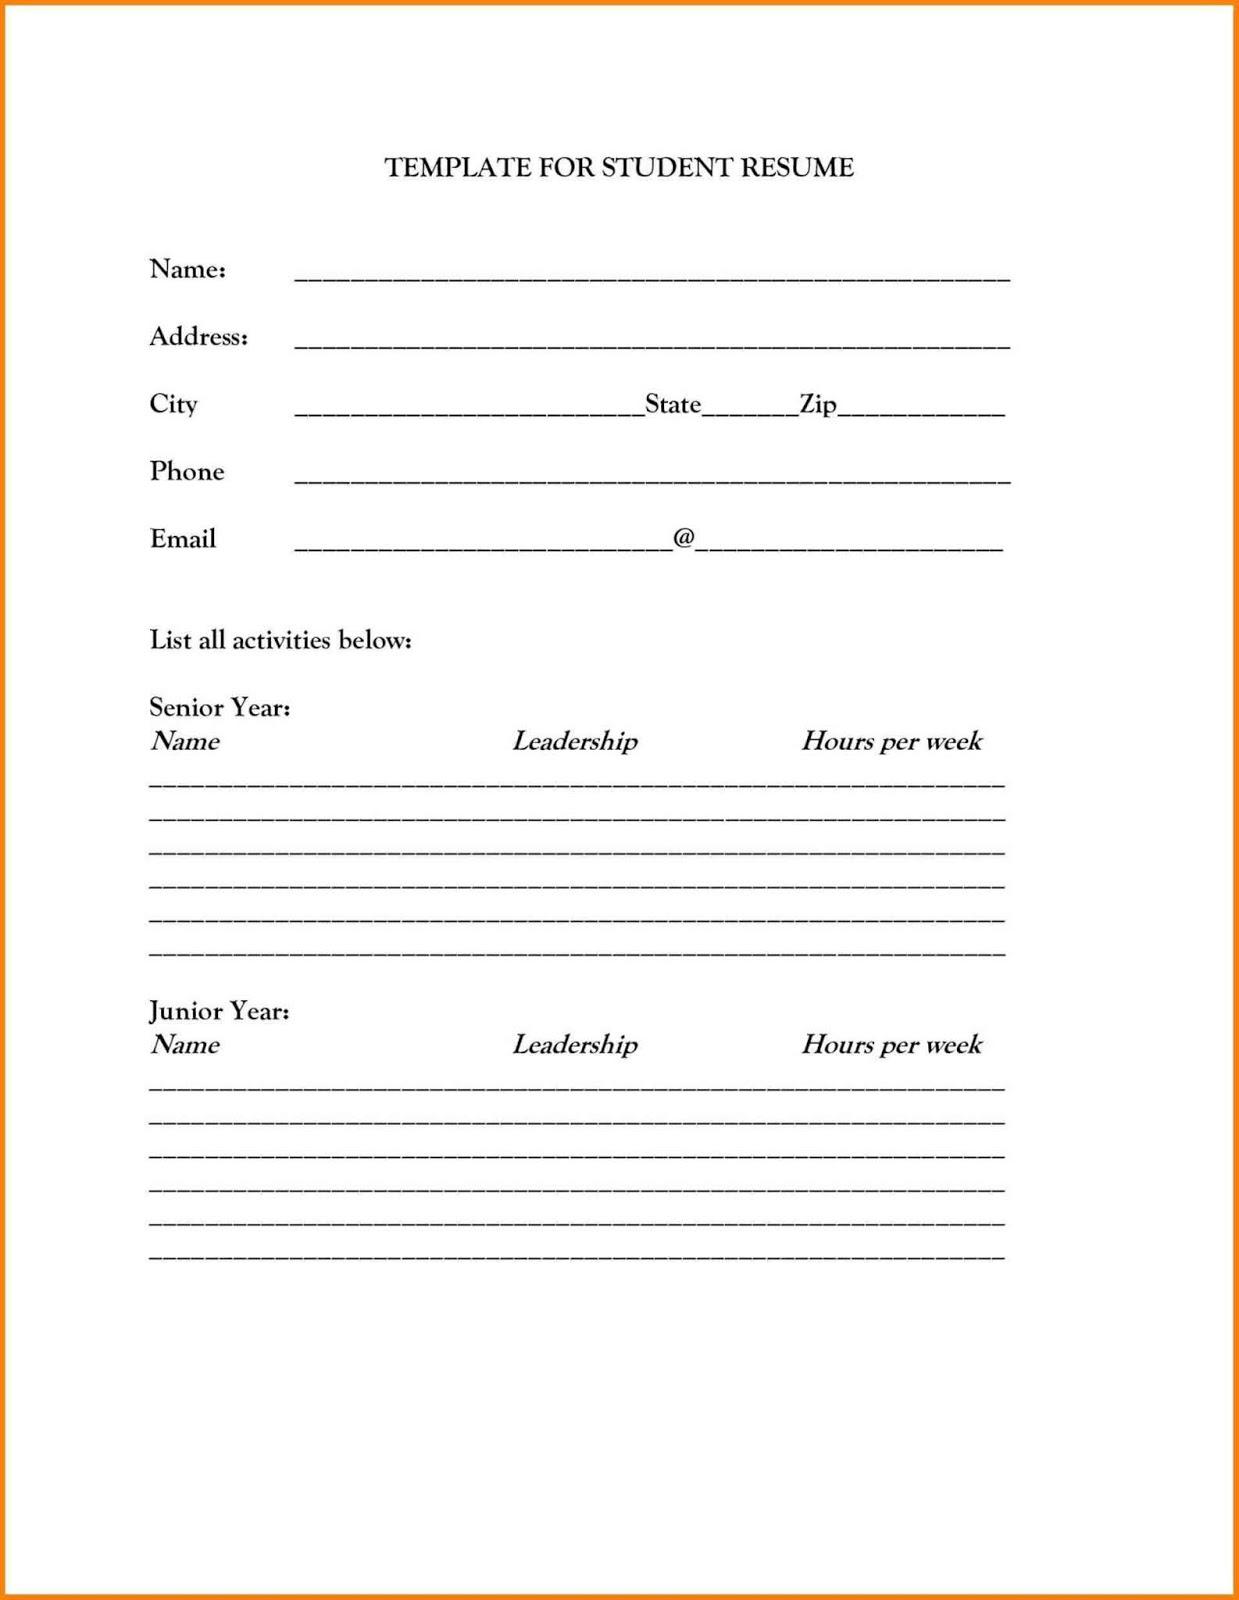 Basic Resume Format 2019 Basic Resume Format Examples 2020 basic resume format basic resume format download basic resume format word basic resume format pdf basic resume format for fresher basic resume format for job basic resume format doc basic resume format examples